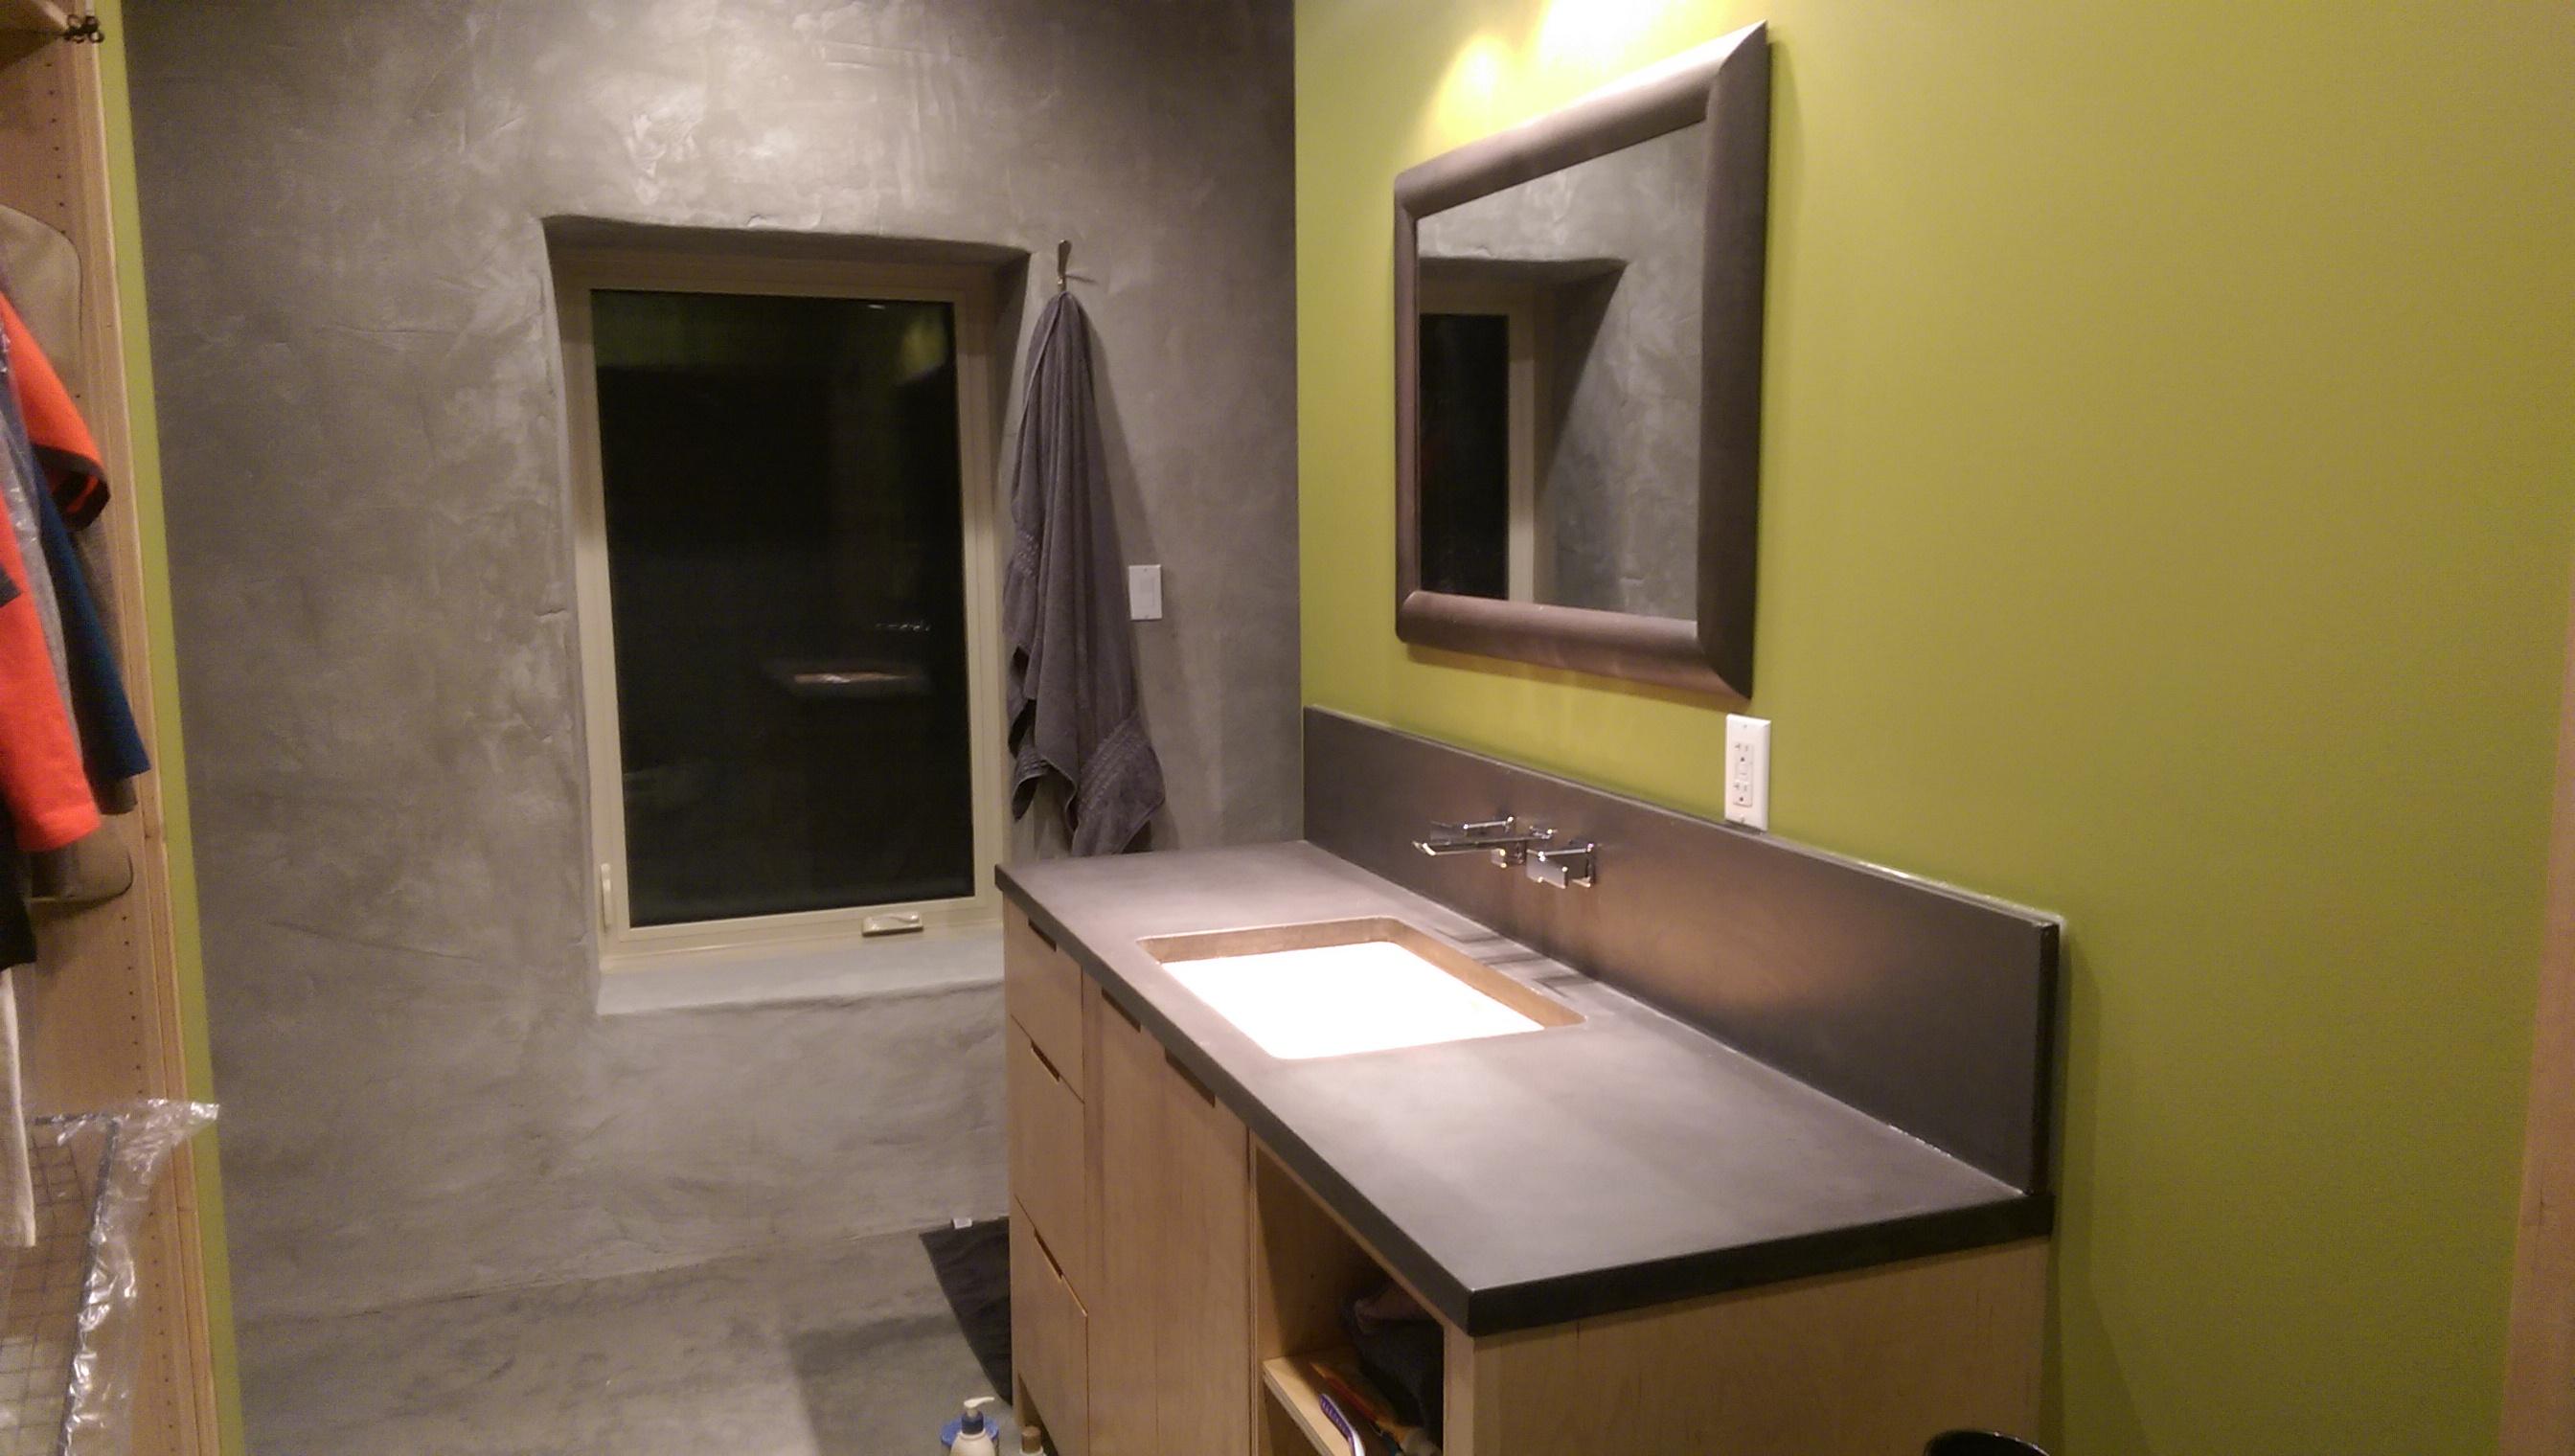 Bathroom Vanity and Backsplash